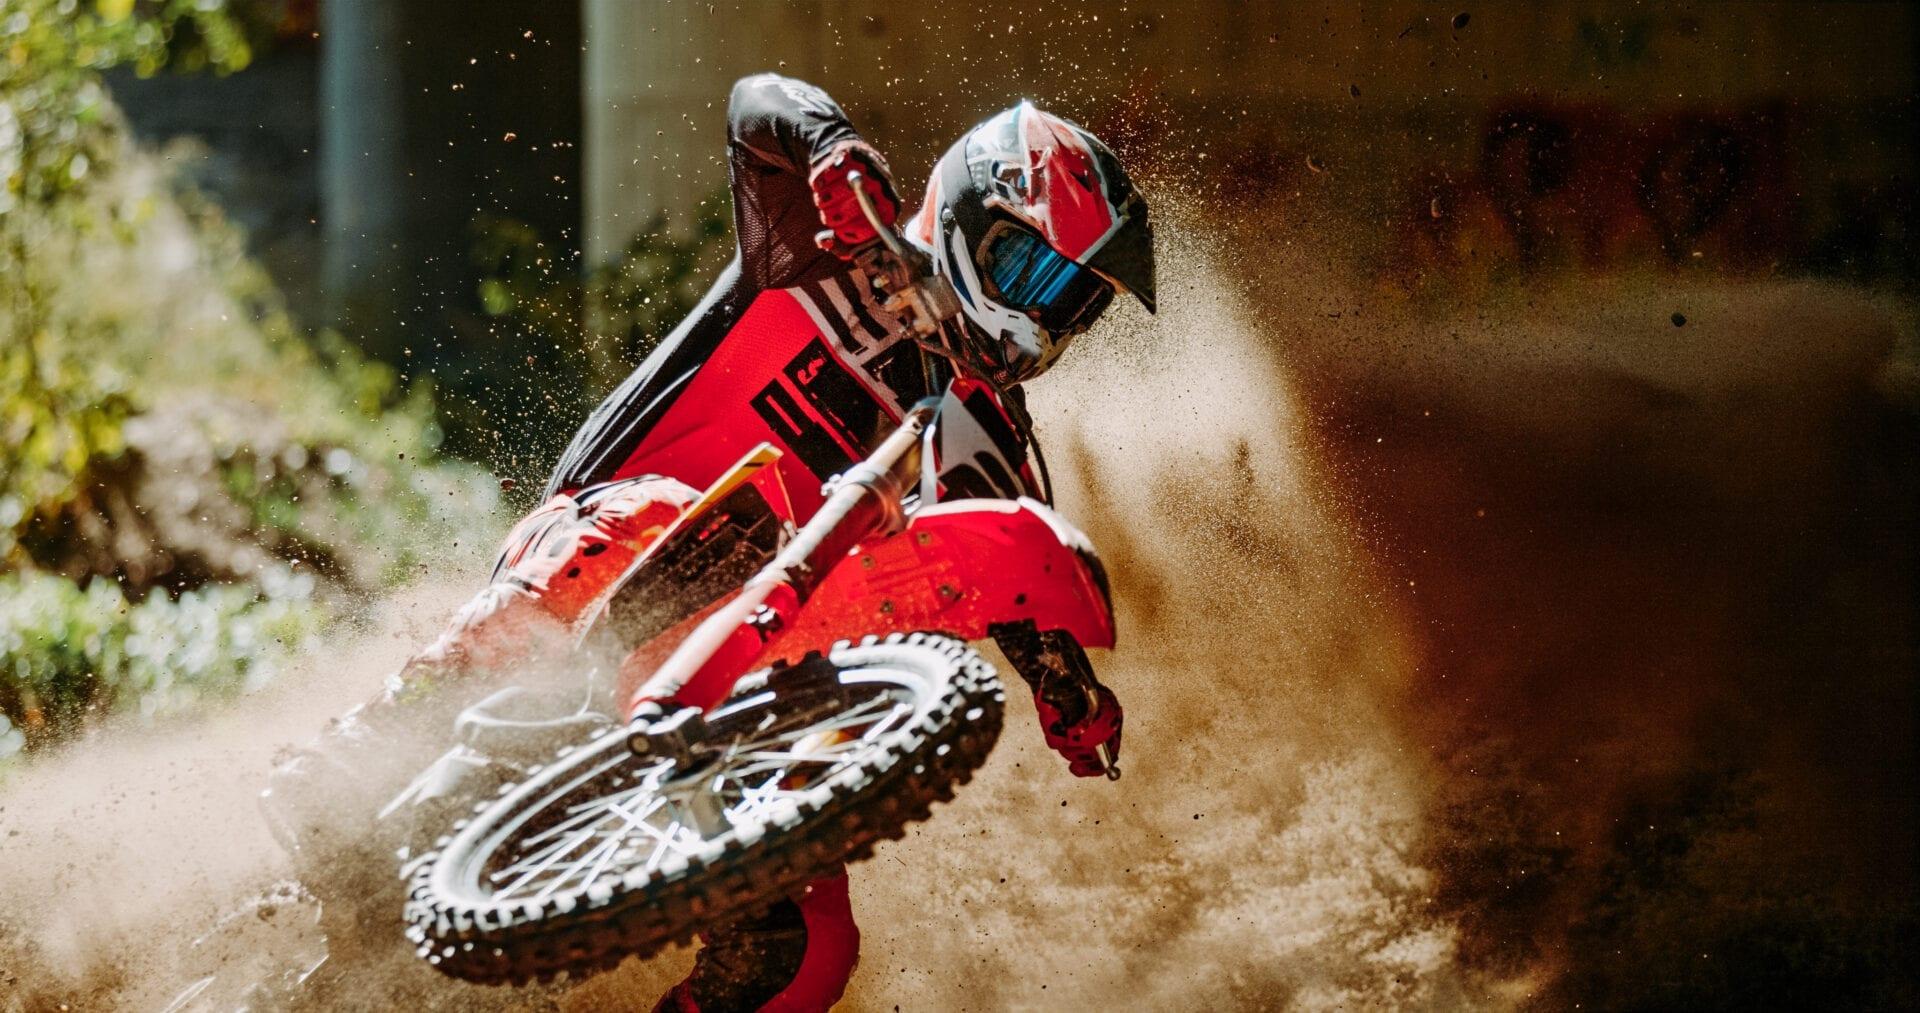 Dirt biker making a turn on a dirt track.